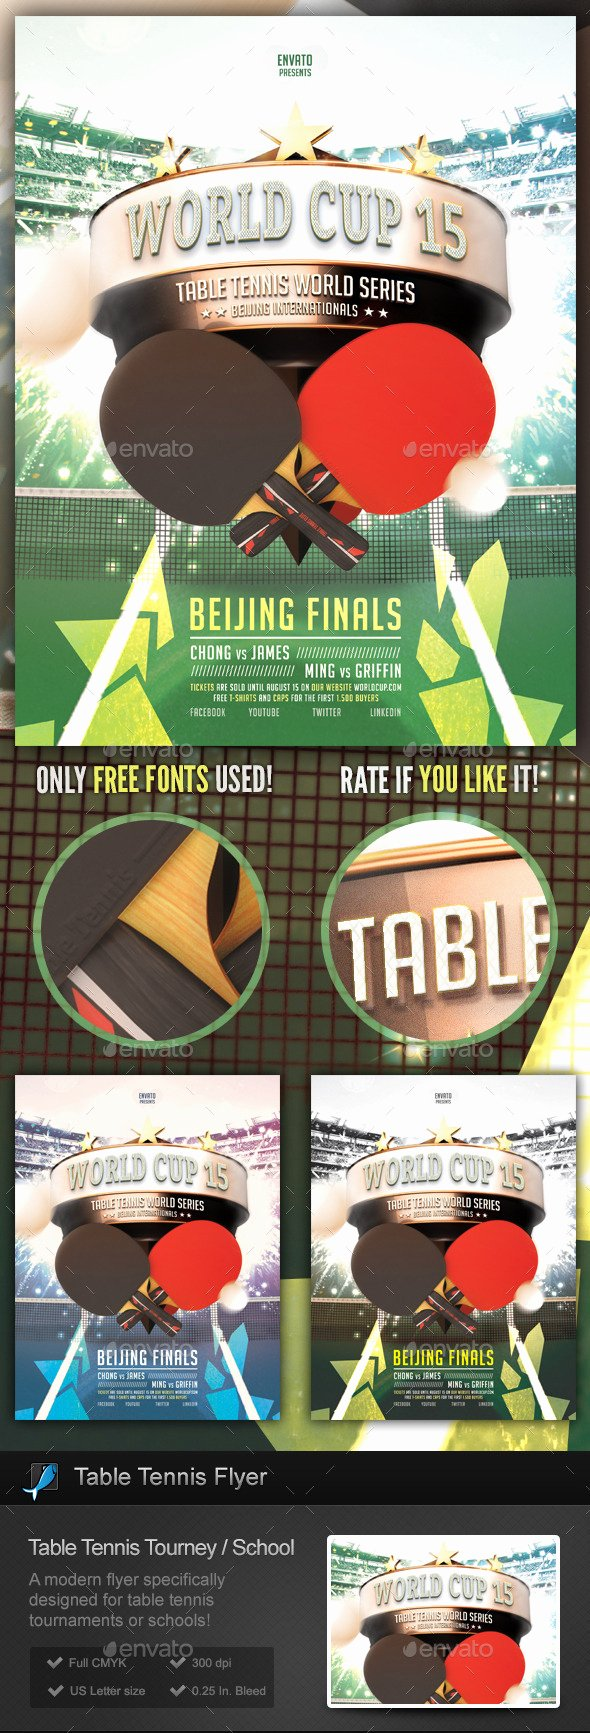 Tennis Flyer Template Free Beautiful Table Tennis tournament School Flyer On Behance